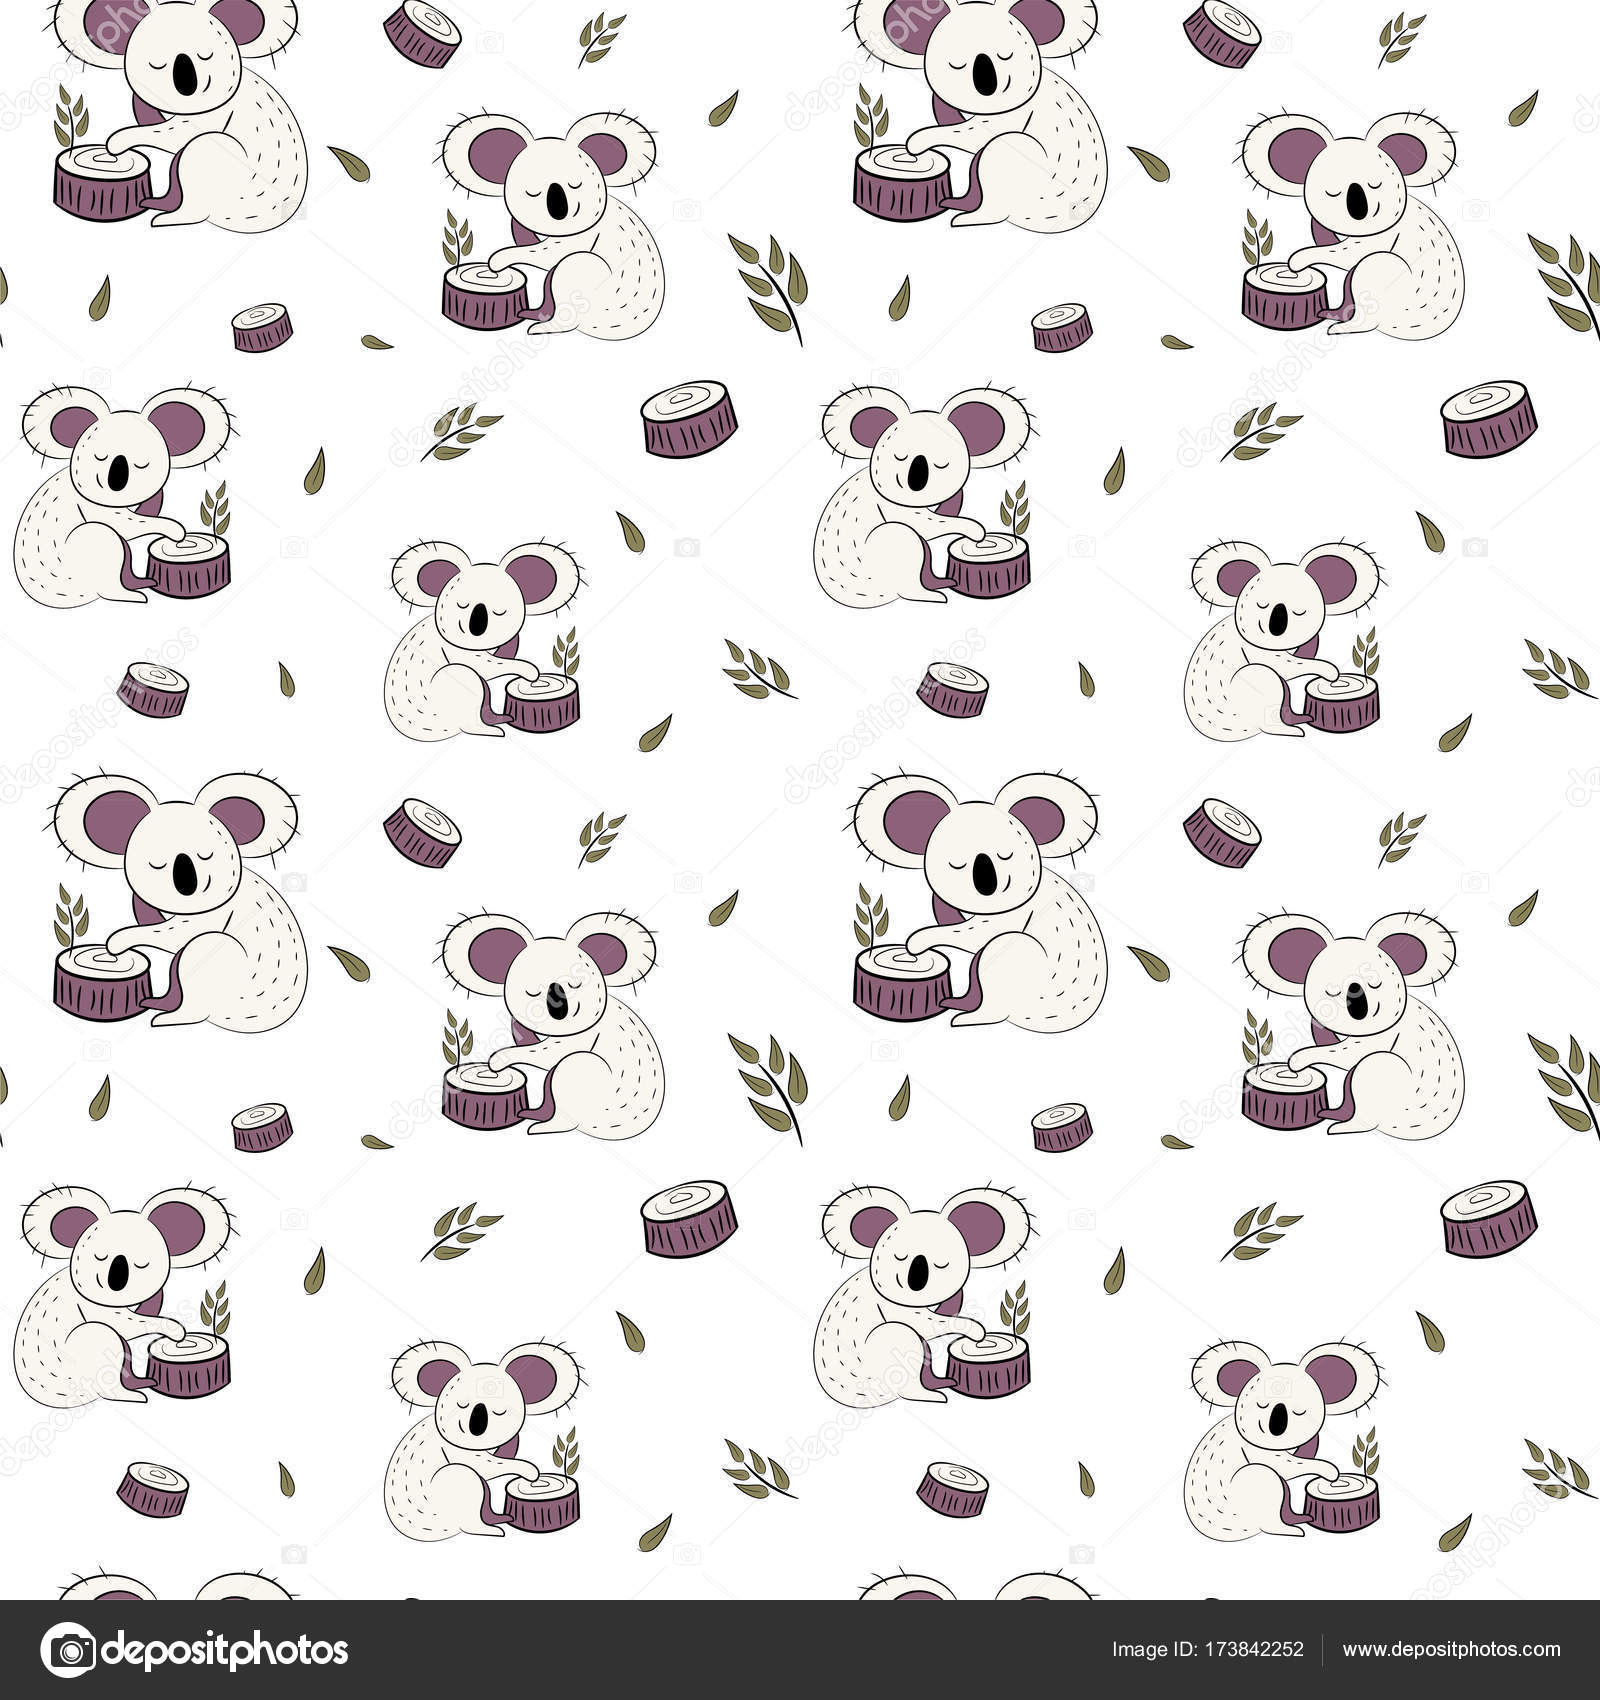 Fondo: koala pantalla   Lindo oso koala doodle de patrones sin ...